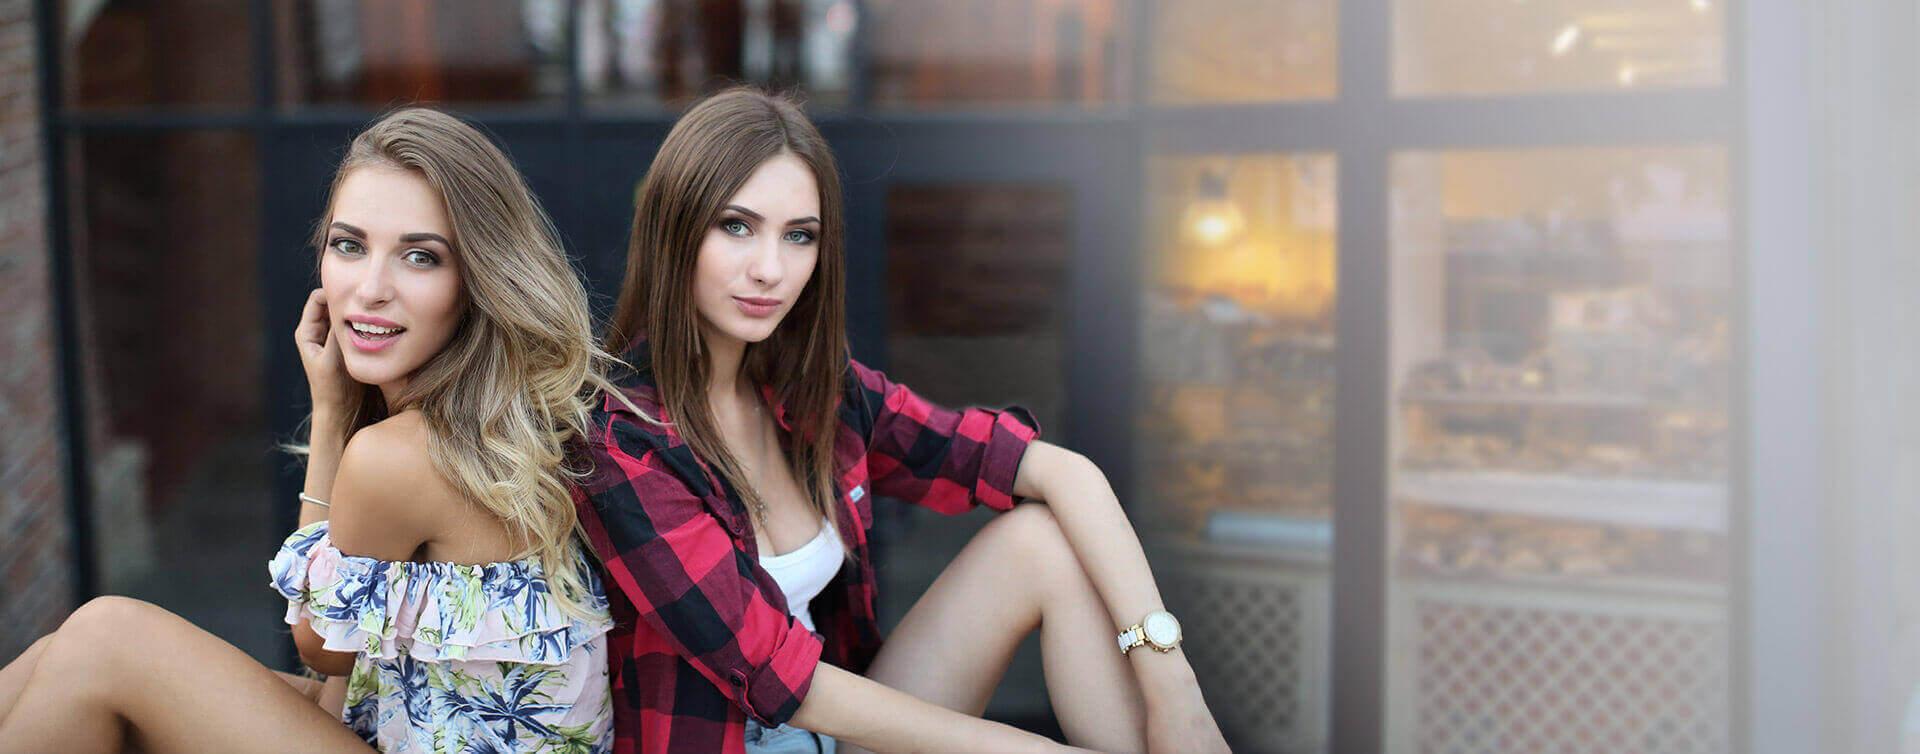 Women Personals Russian Singles More